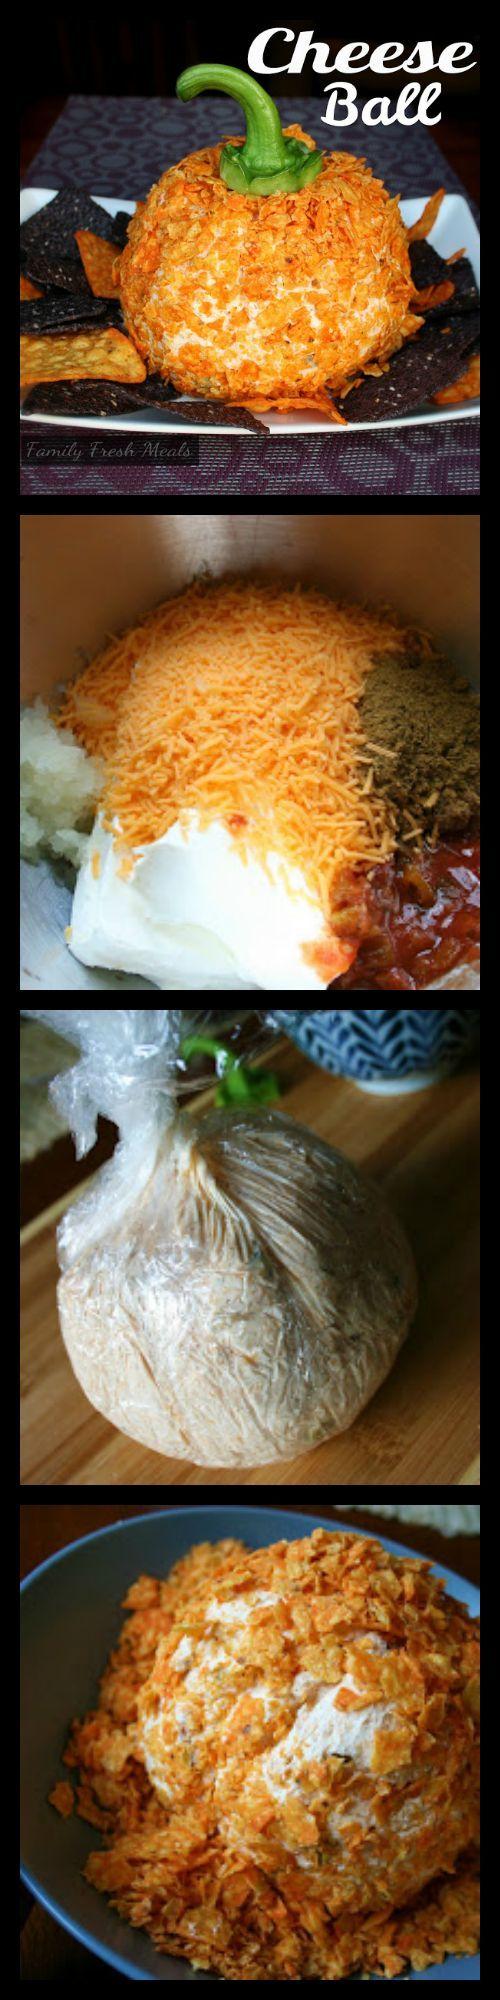 FALL RECIPES | Pumpkin Shaped Cheese Ball {Recipes for Halloween & Thanksgiving}